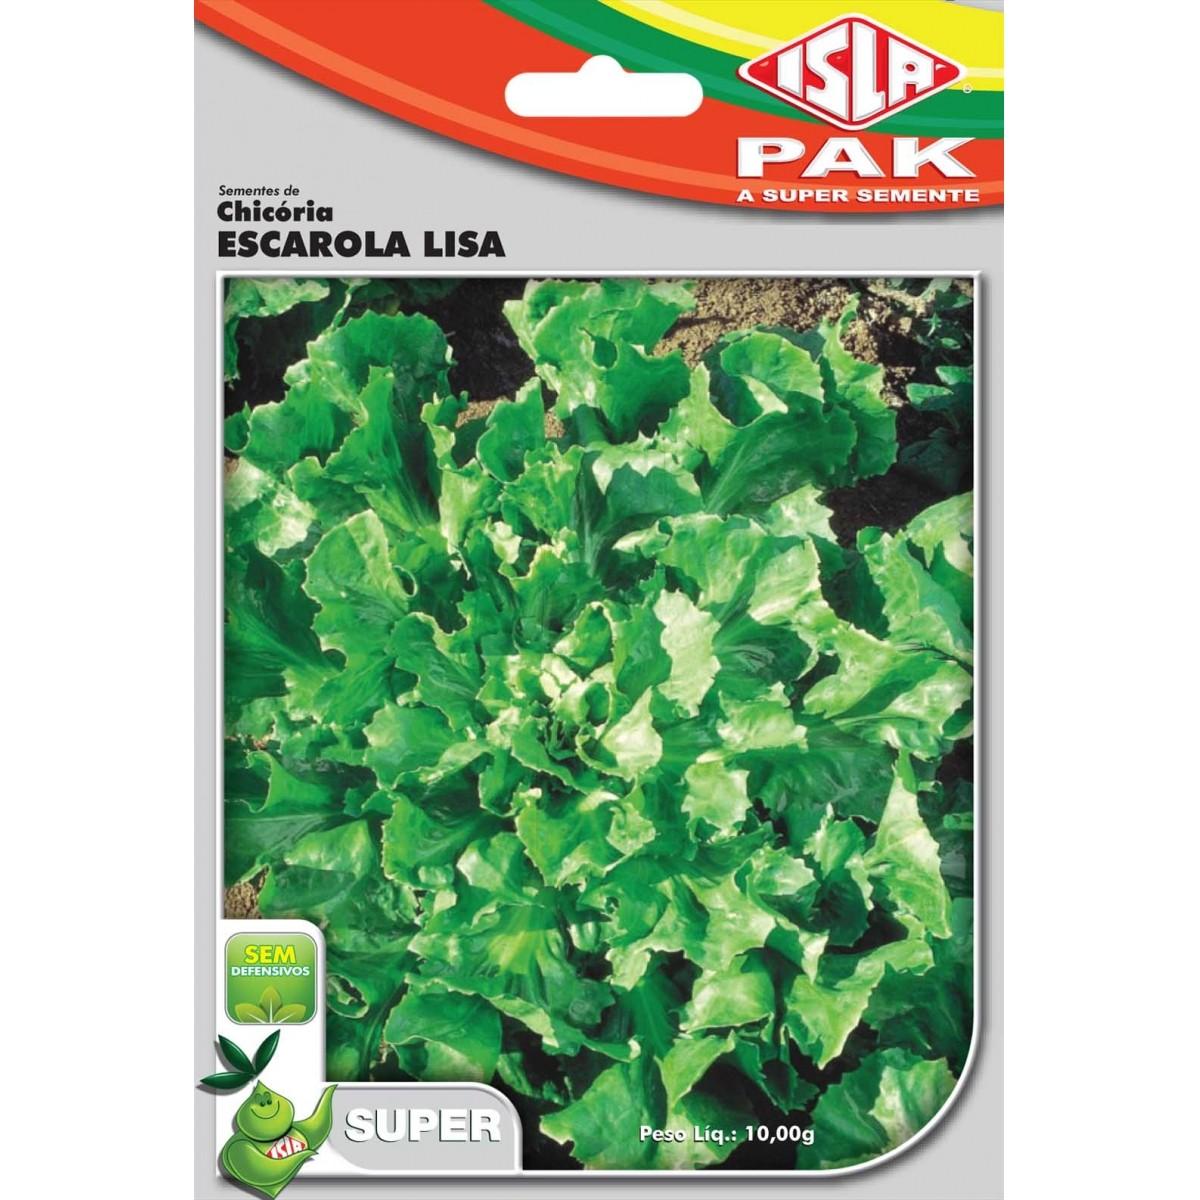 Sementes de Chicória Escarola Lisa - Isla Superpak